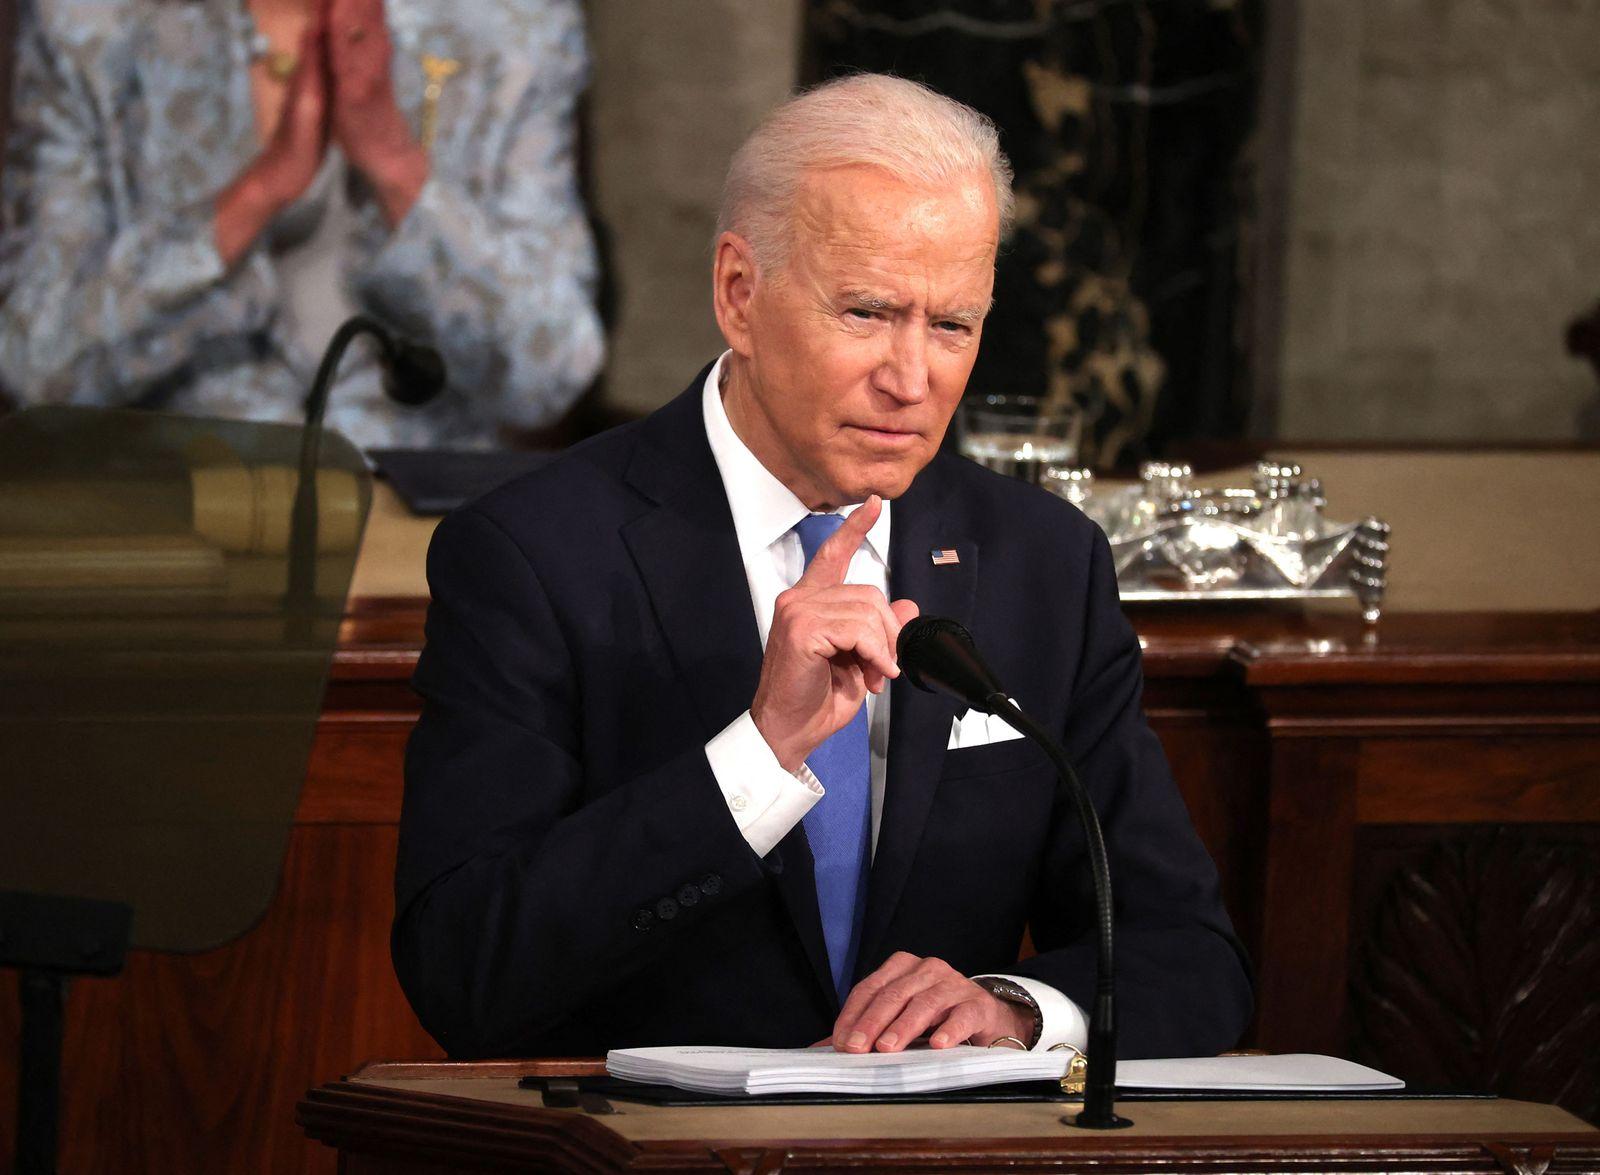 Biden addresses Congress to mark 100 days in office